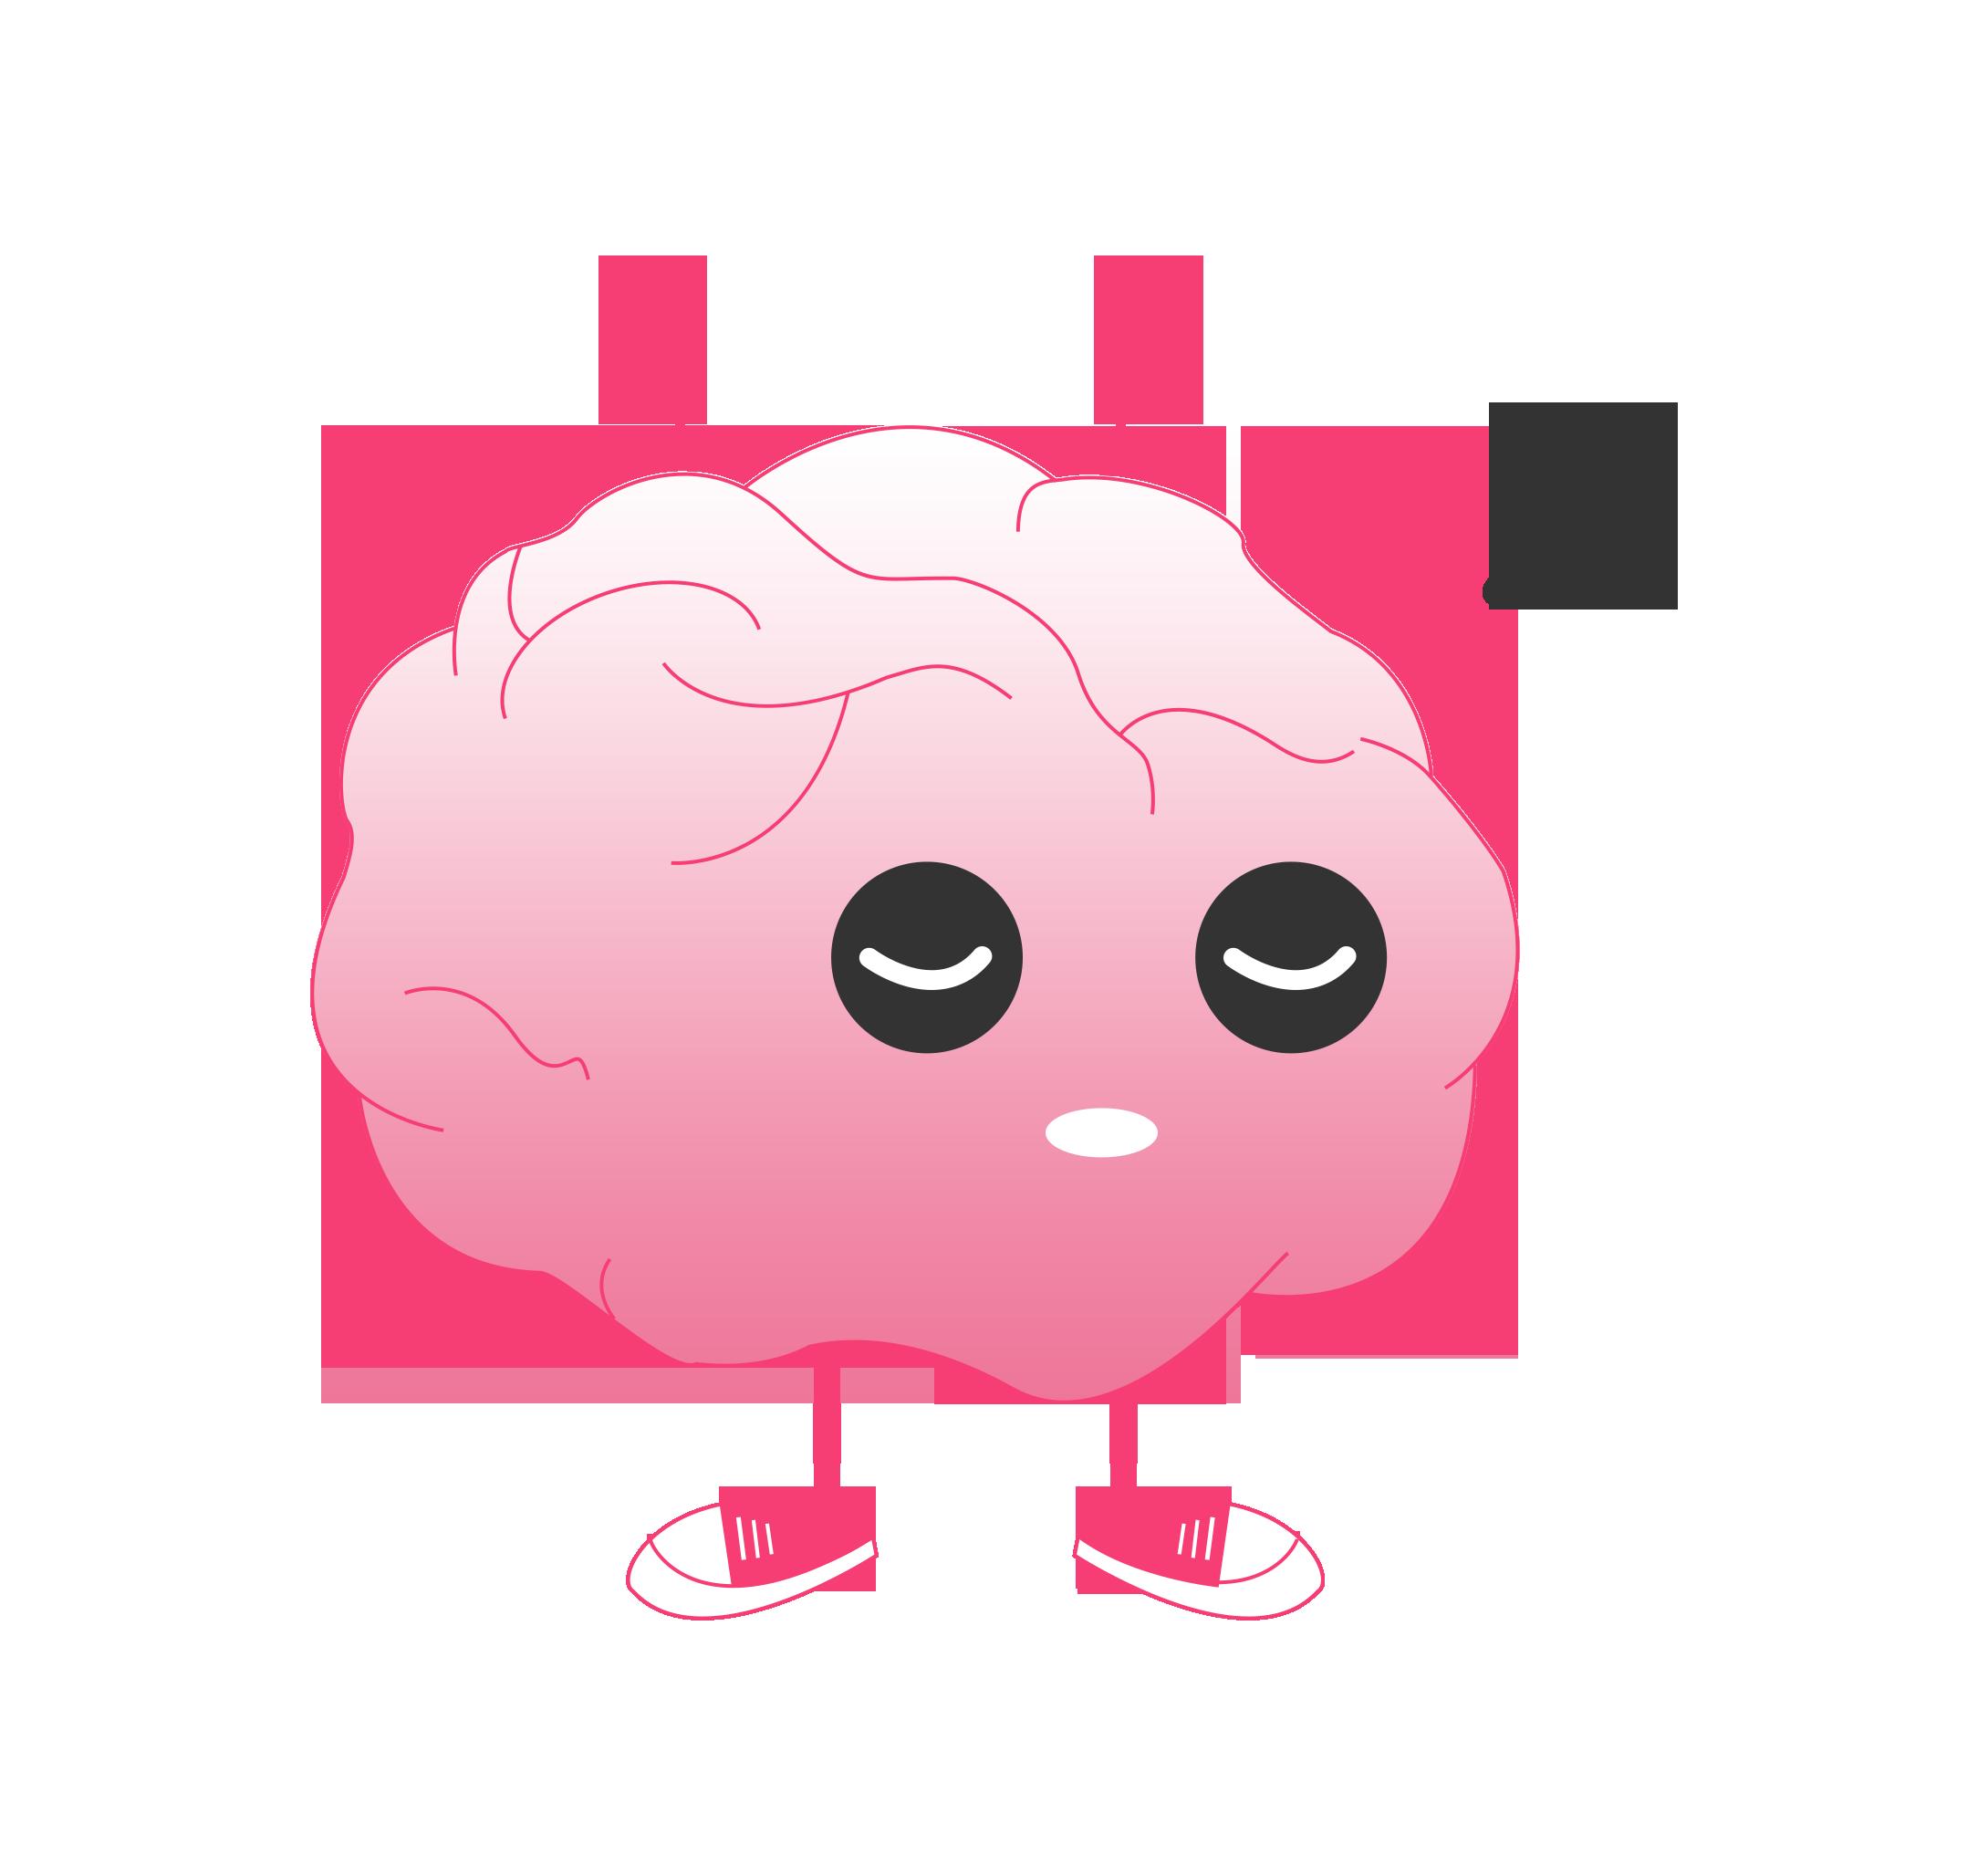 脑洞大师-Emoji样式贼多 messages sticker-10